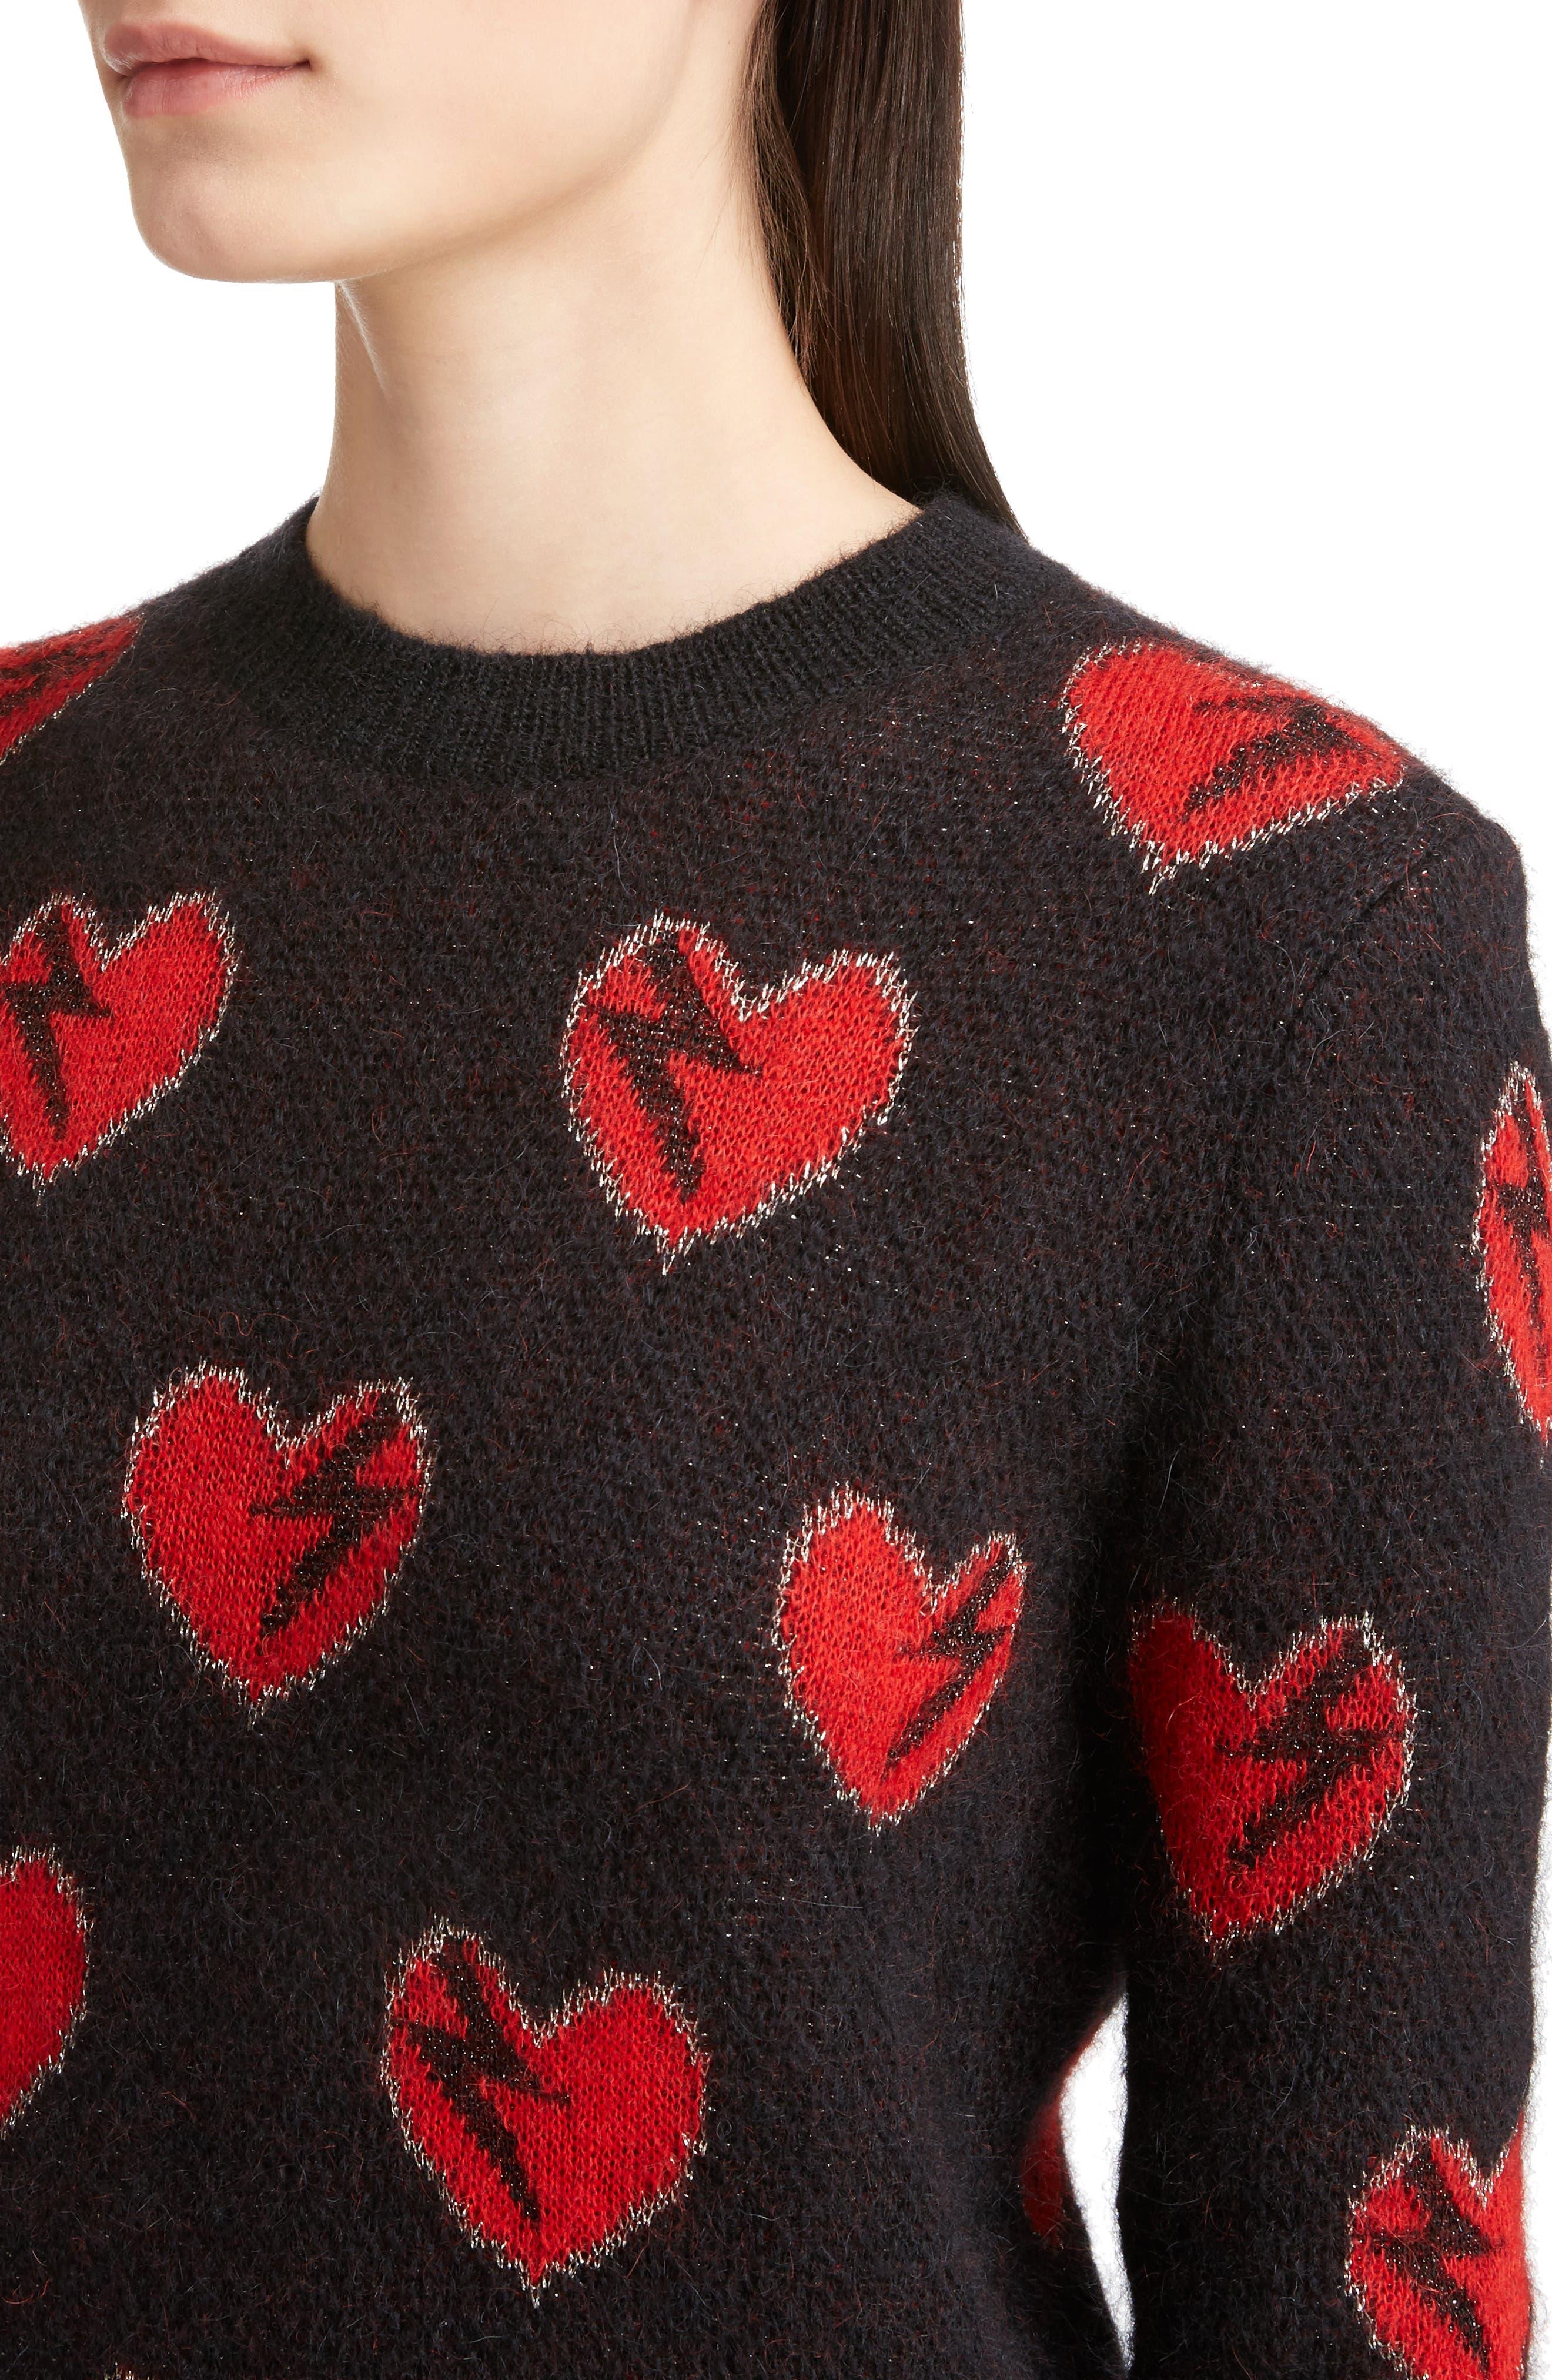 Heart Jacquard Mohair Blend Sweater,                             Alternate thumbnail 4, color,